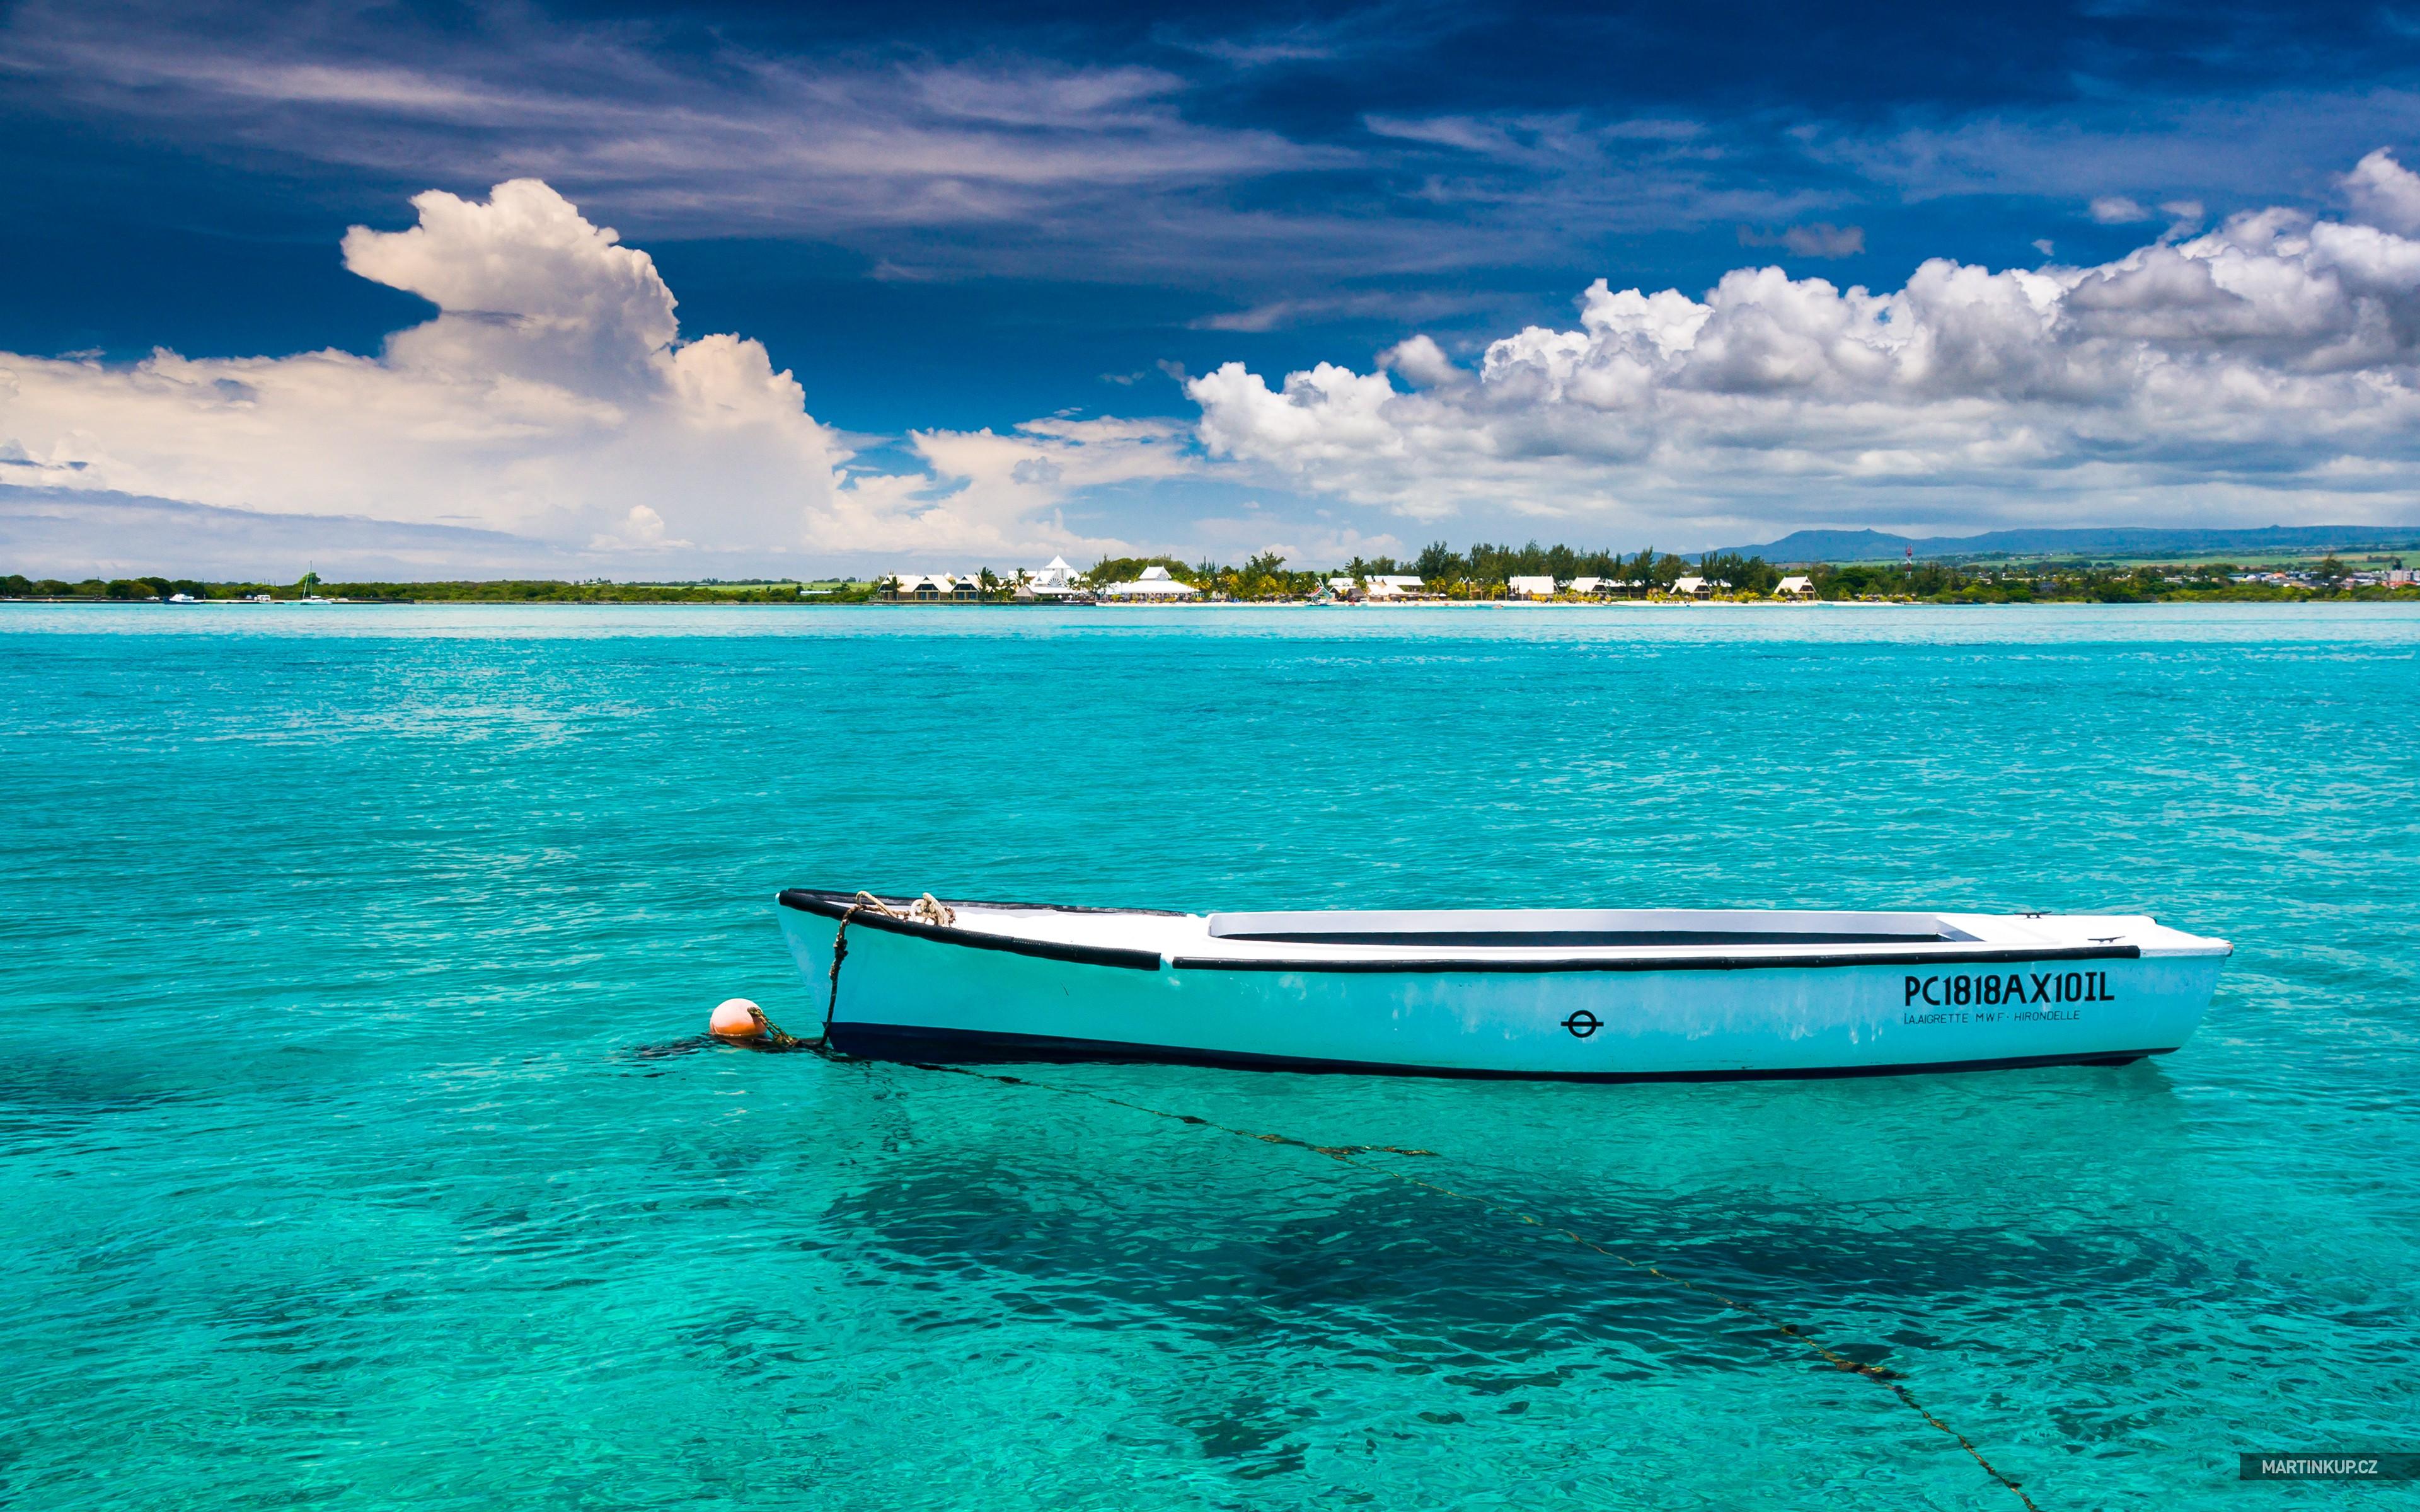 3840x2400 wallpaper ocean boat - photo #9